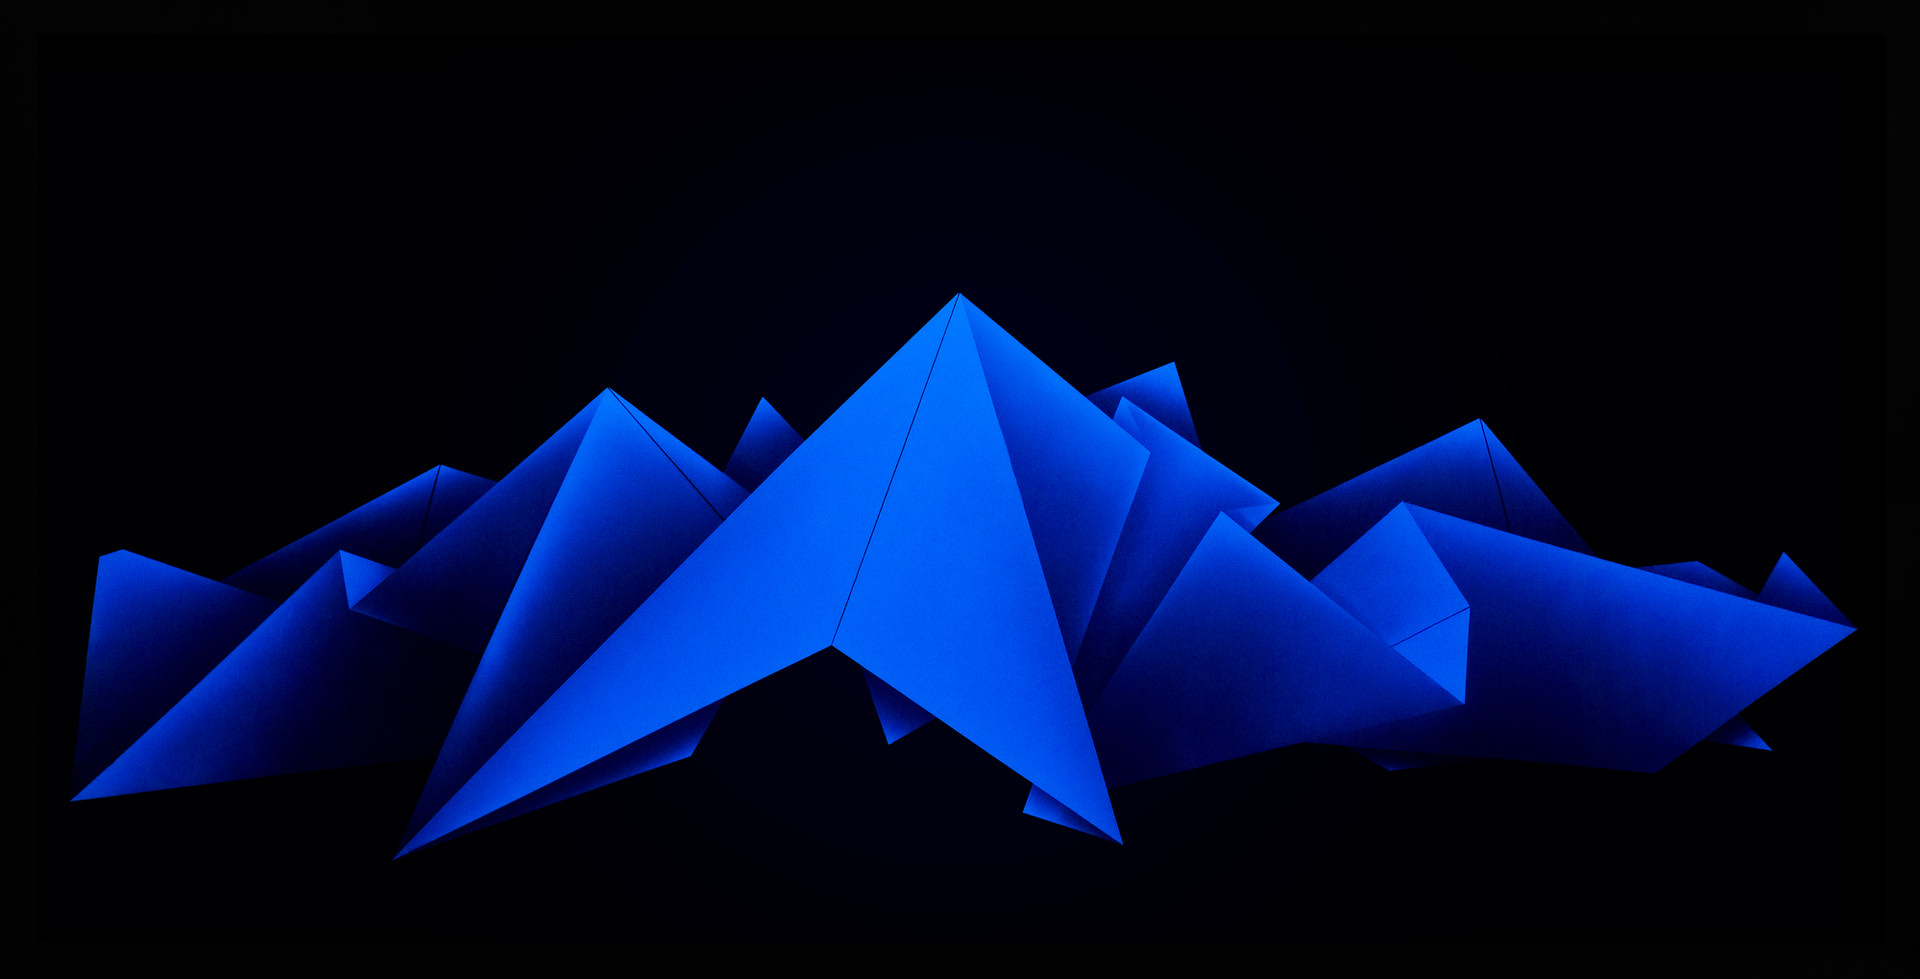 Zac Koukoravas-Blue Lines-2017-acrylic and enamel paint on acrylic-243x123cm.